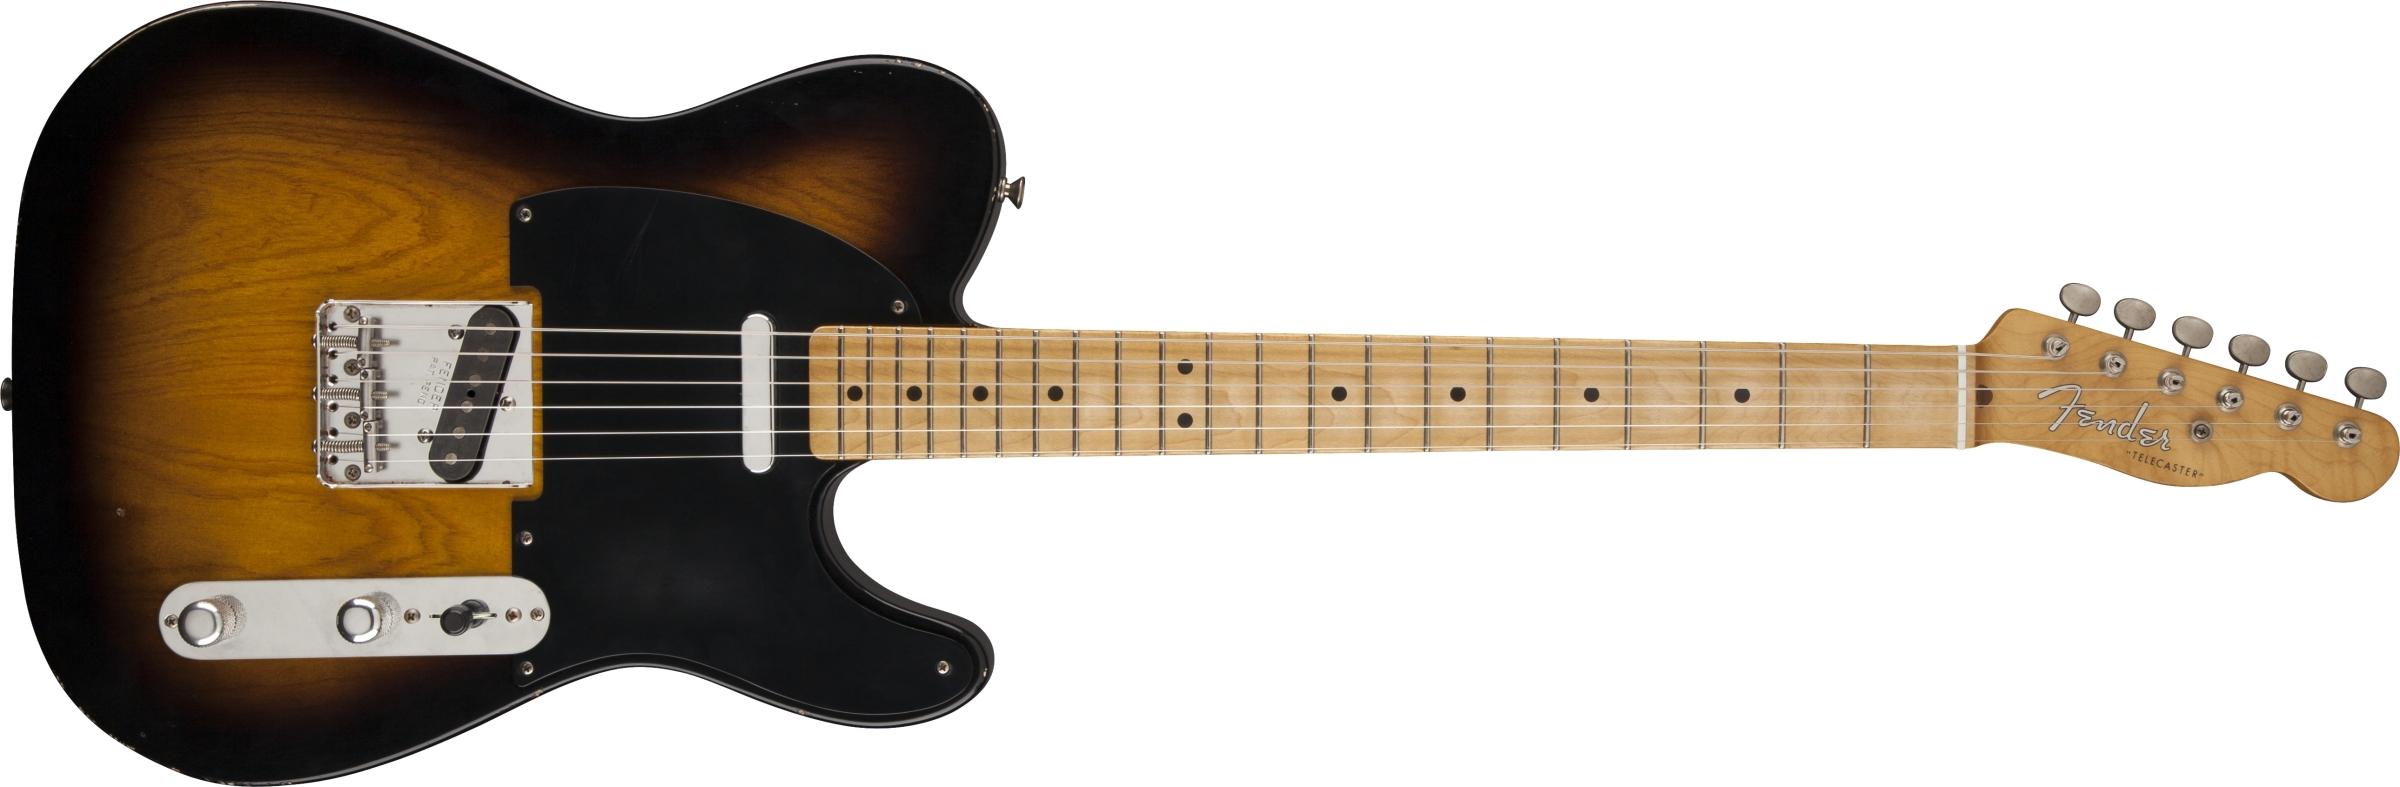 Acoustasonic Telecaster Wiring Diagram Library Of Modern Fender Road Worn 50s Maple Fingerboard 2 Color Sunburst Rh Shop Com 5 Way Switch Squier